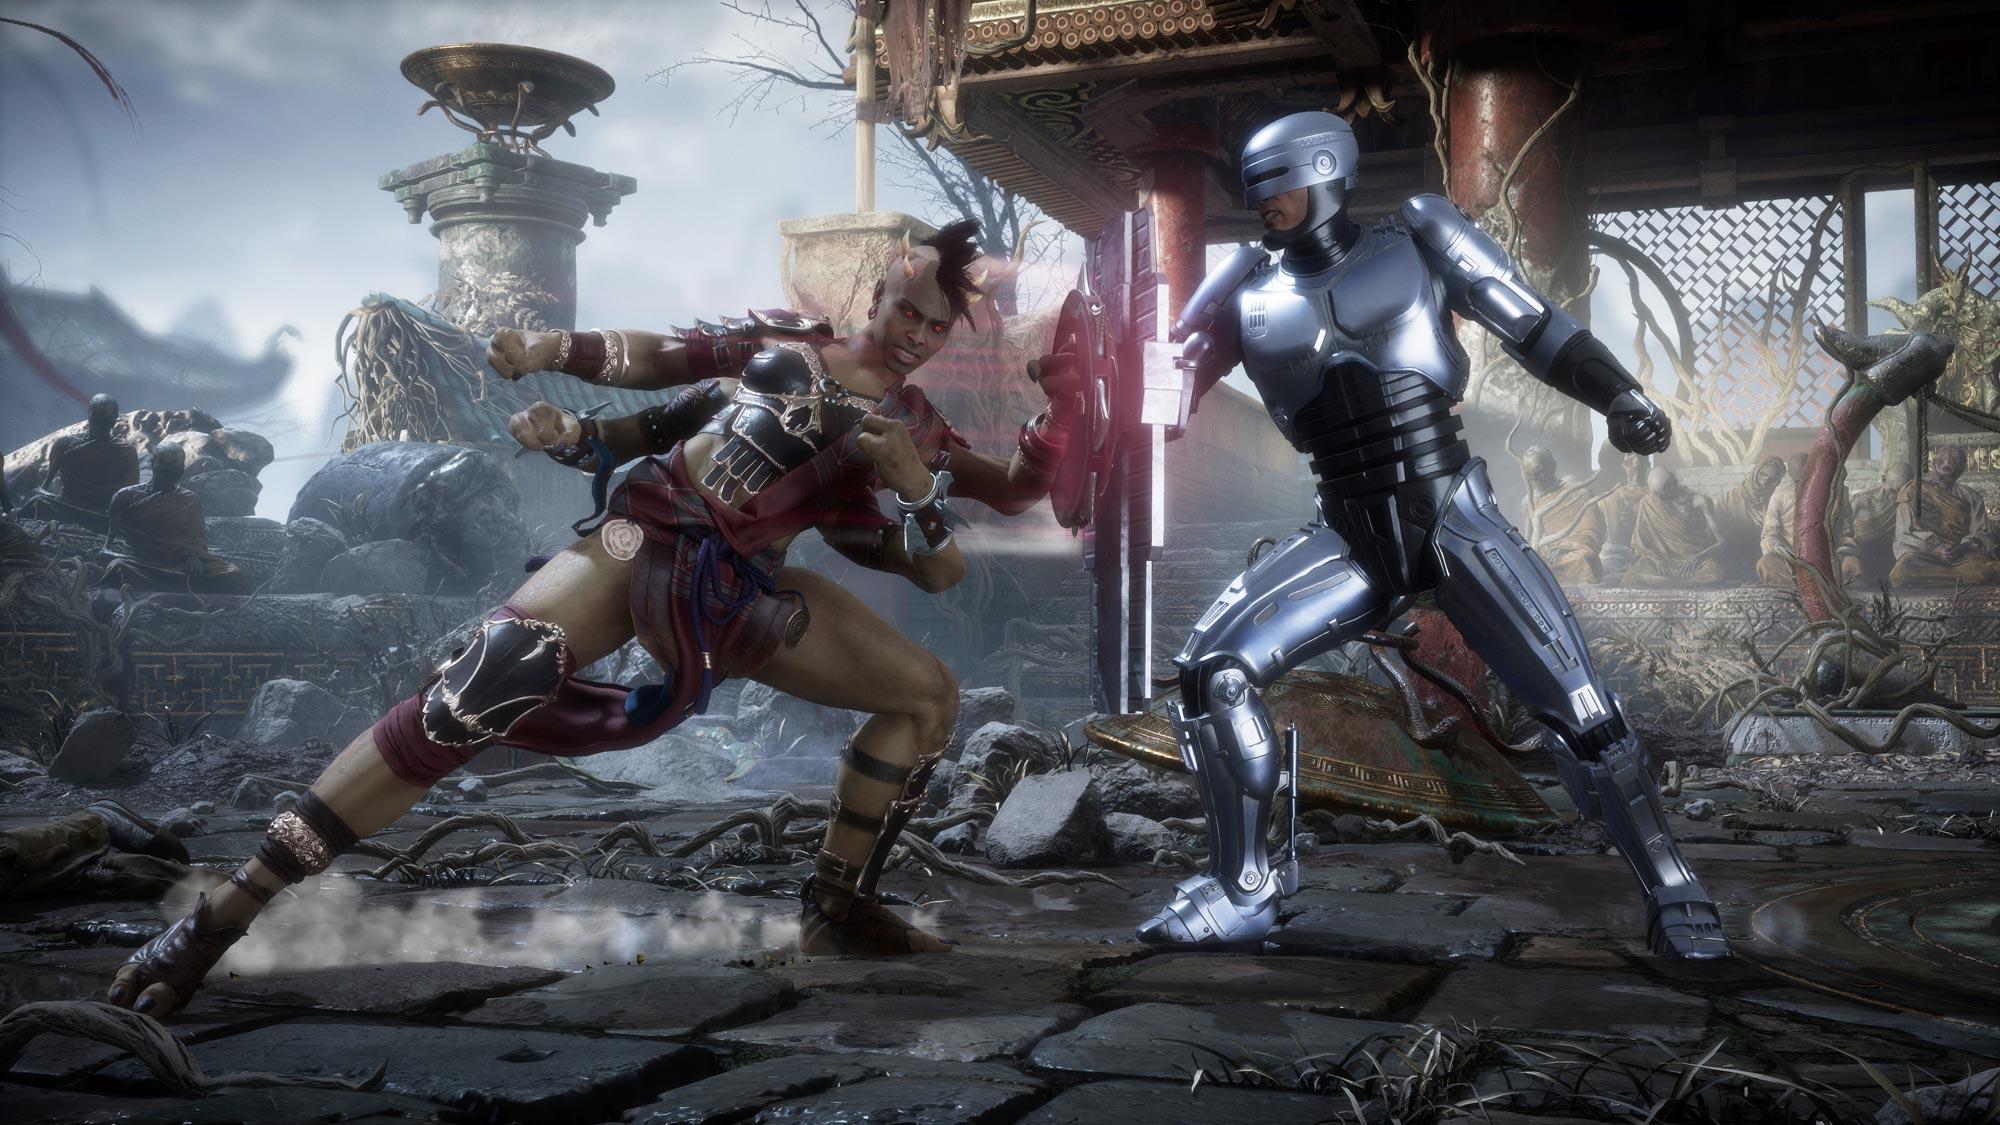 Mortal Kombat News Updates and RANTING - YouTube